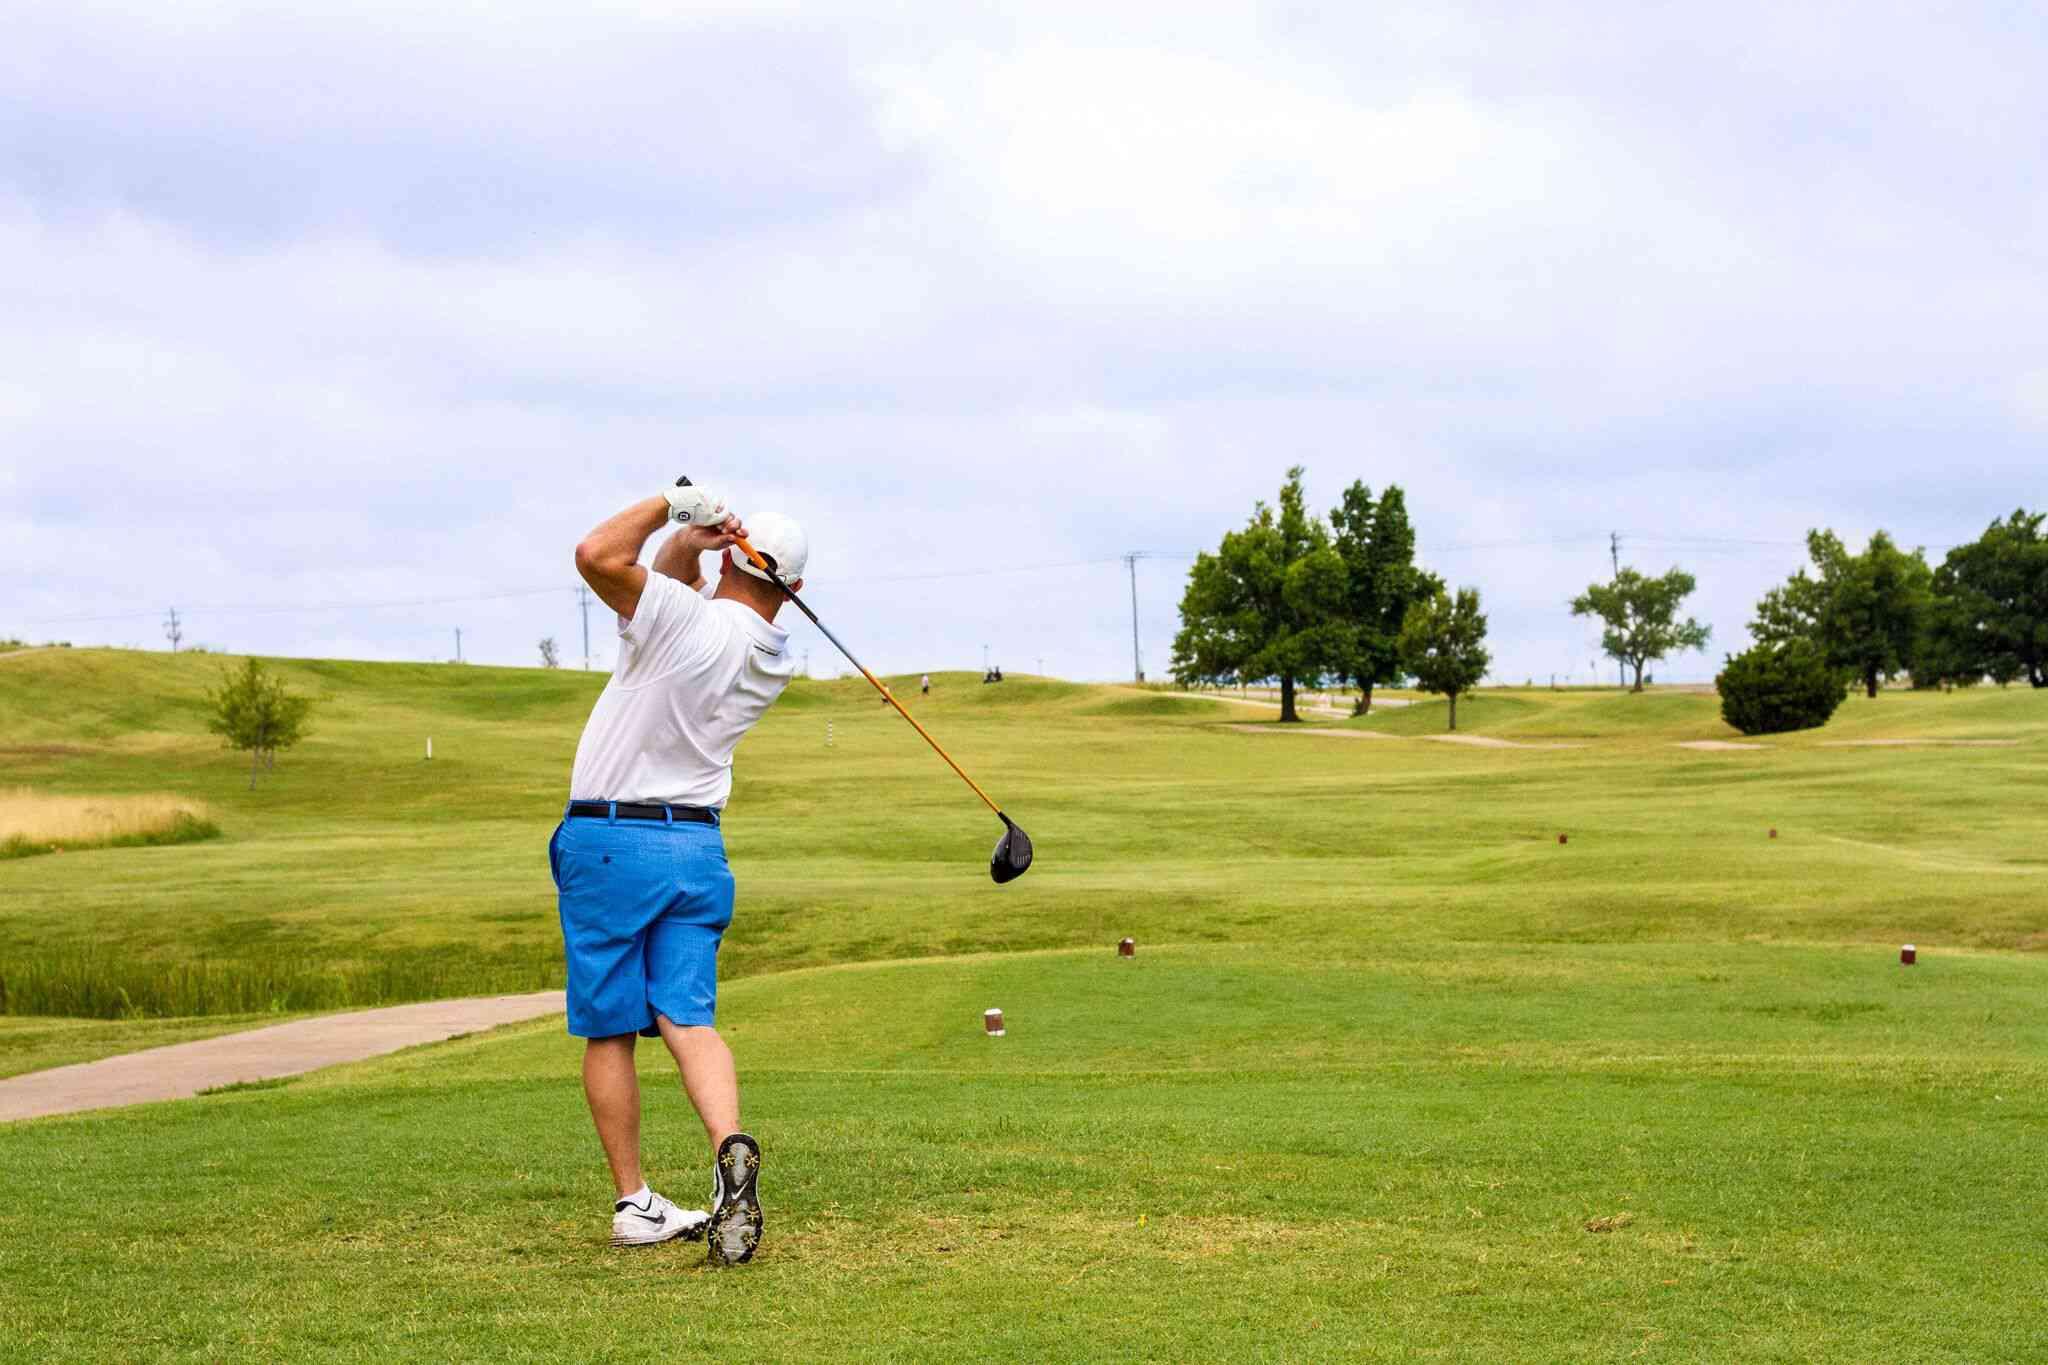 ManpPlaying golf at Crimson Creek Golf Course